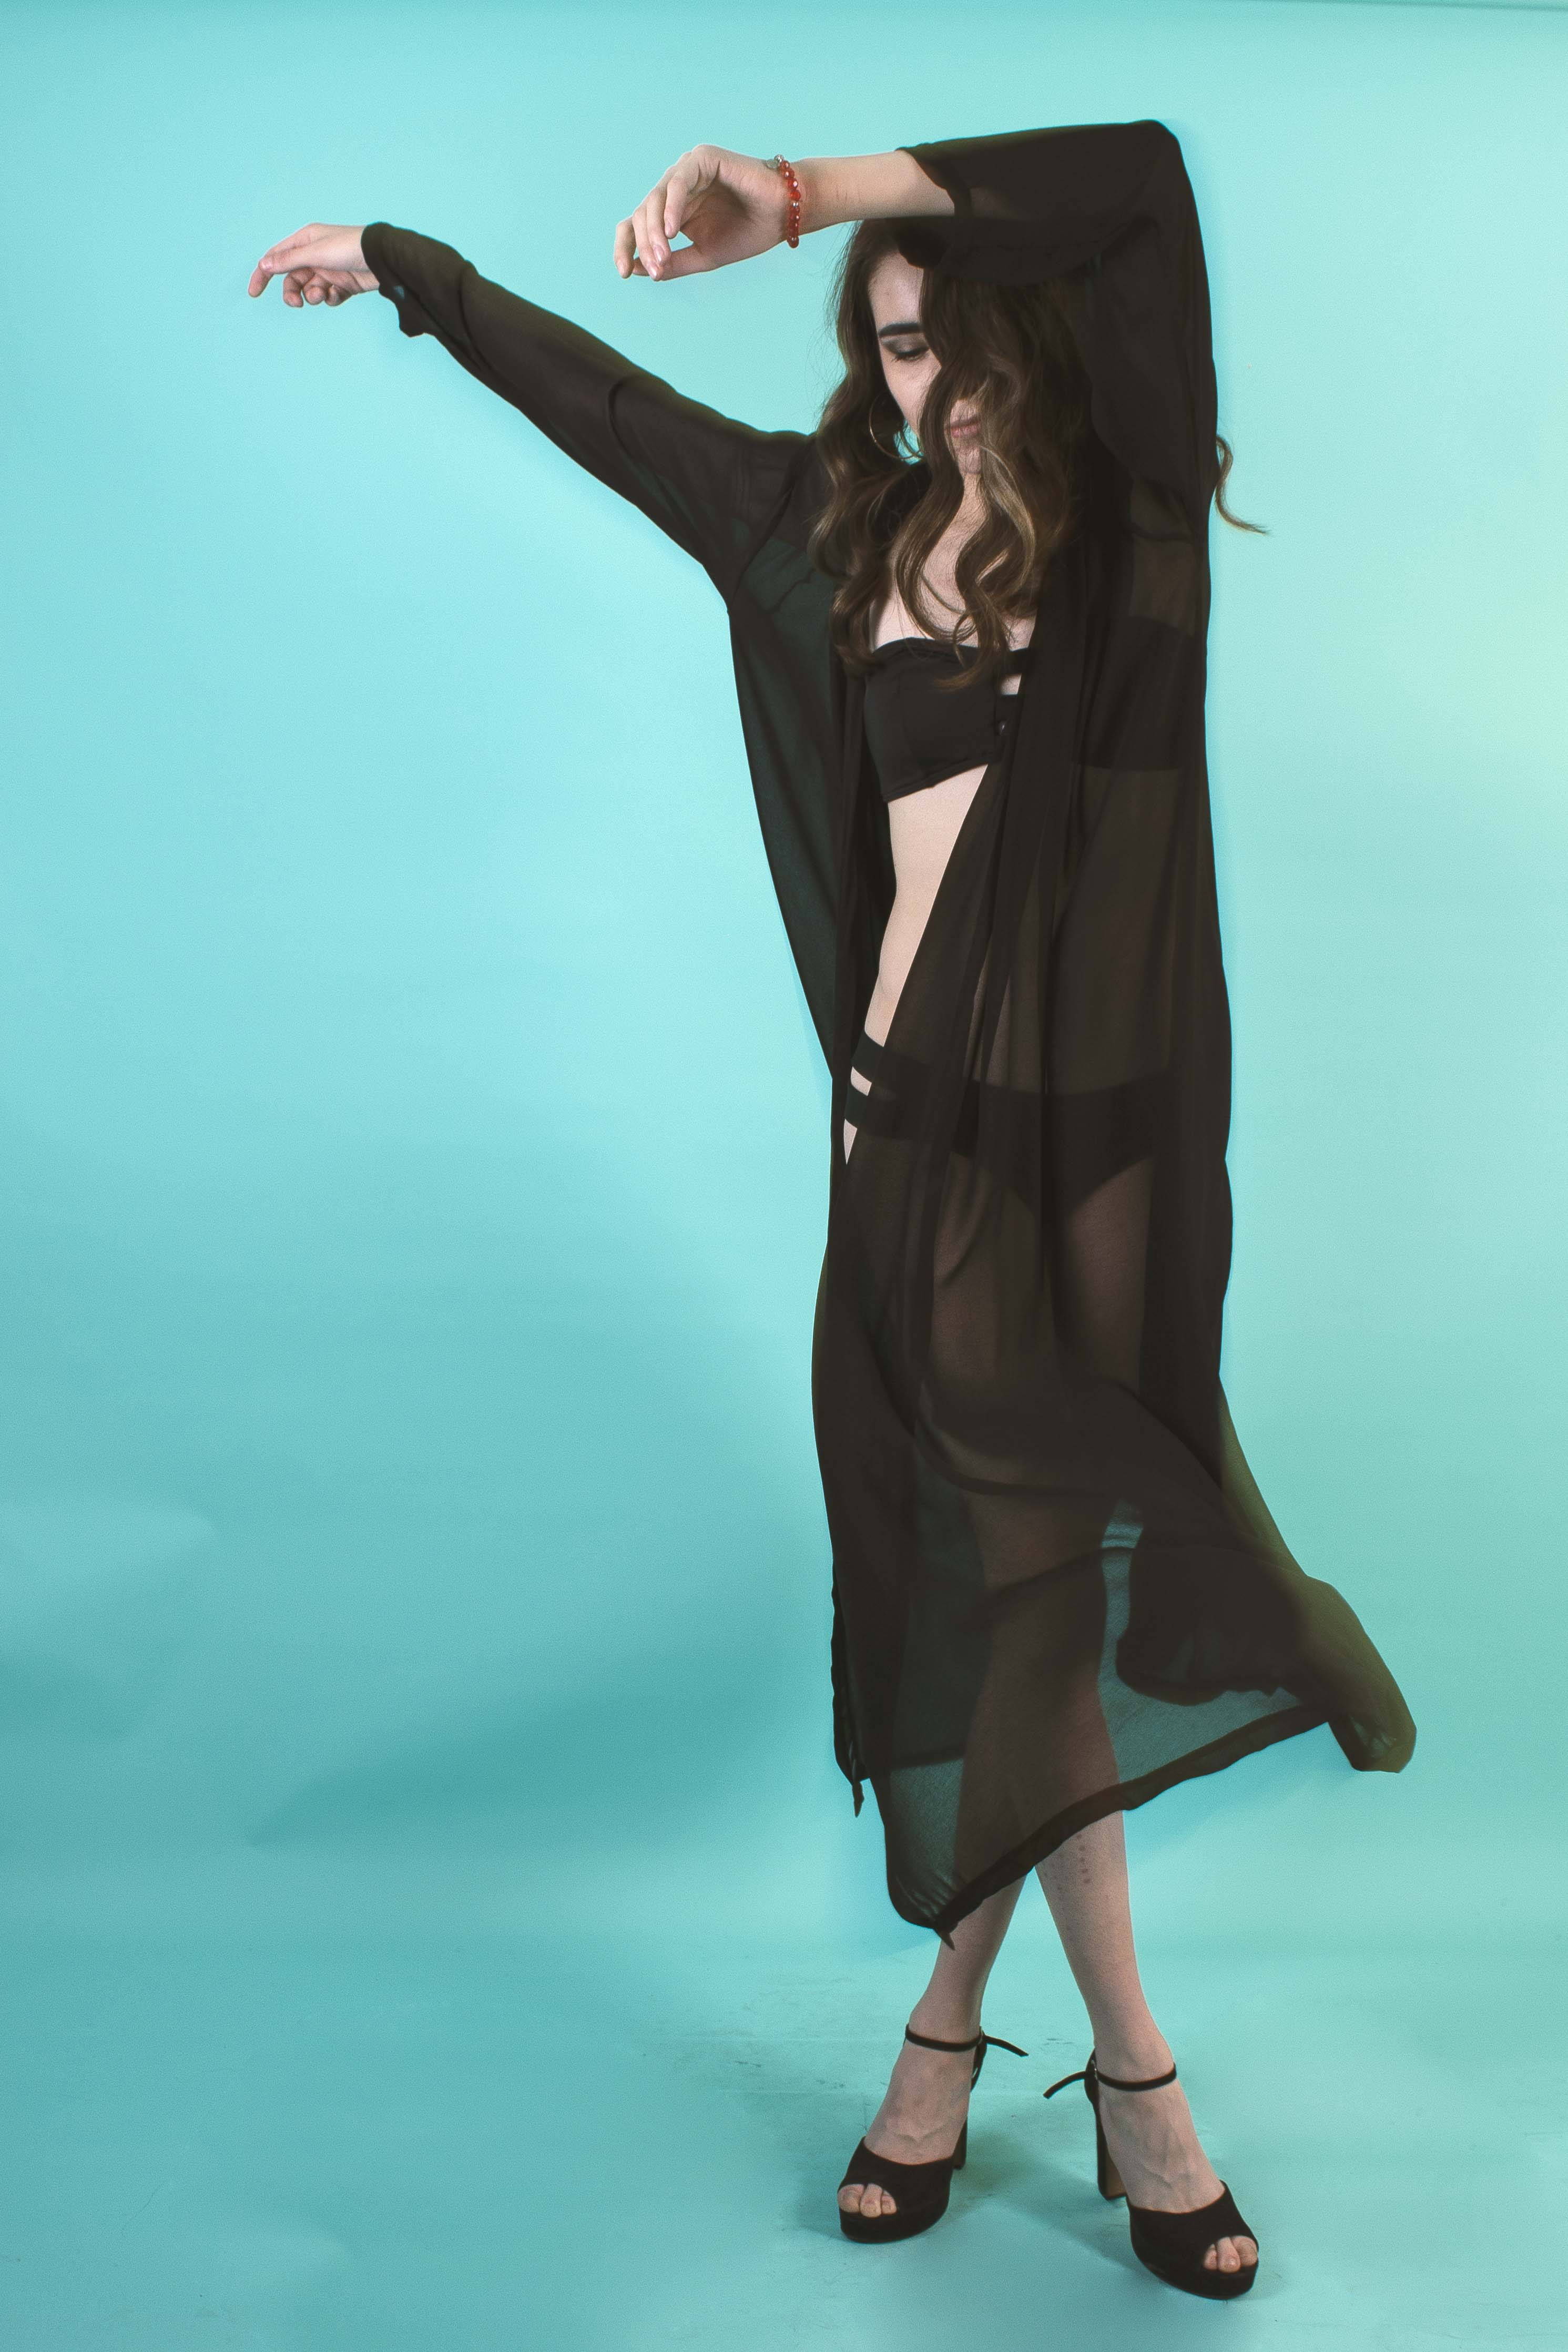 Capa Bikini Elegante Transparencia